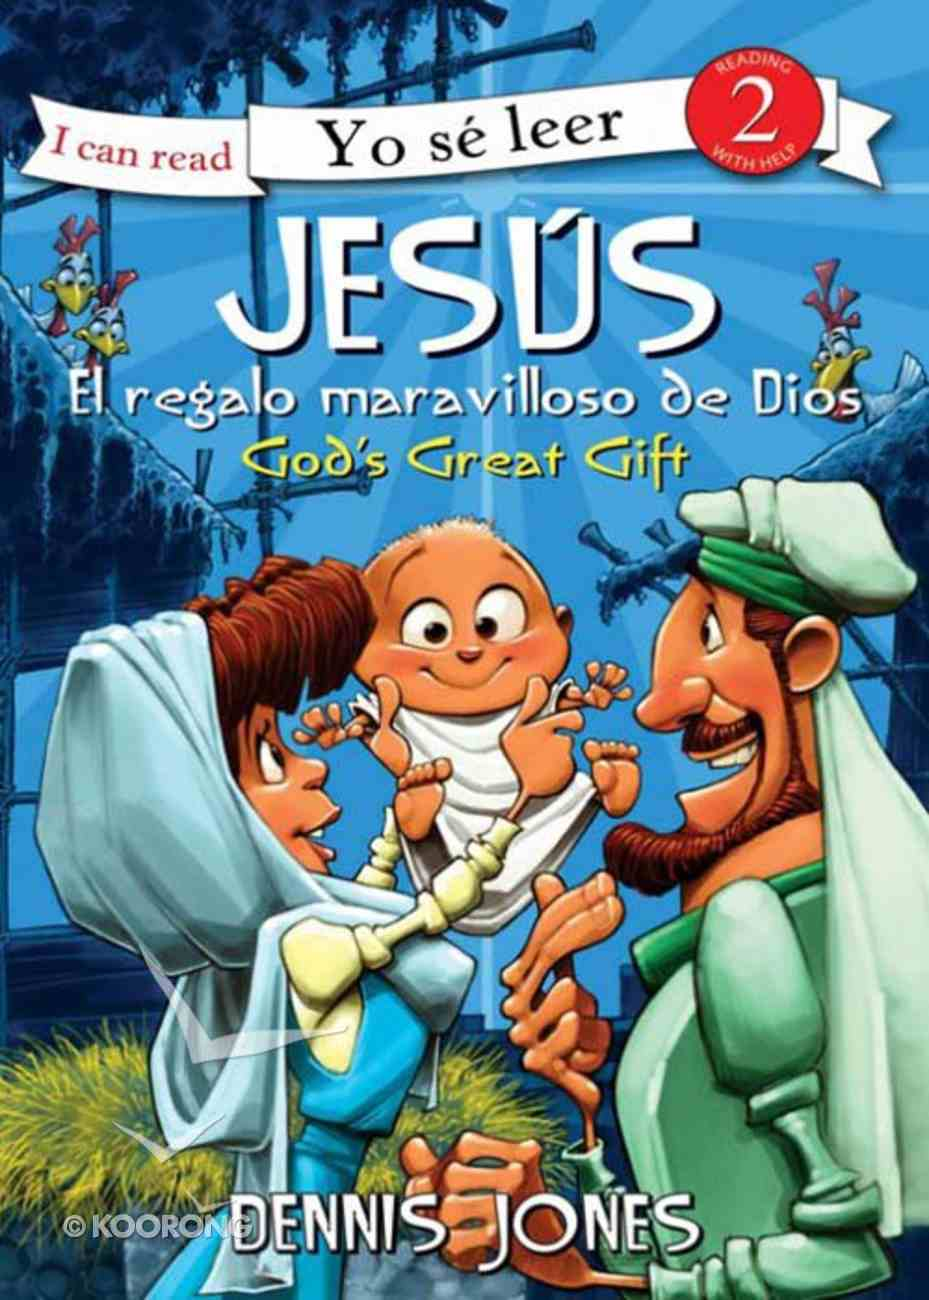 Jesus Gran Regalo De Dios (Spanish) (Spa) (Jesus, God's Great Gift) (I Can Read!2/biblical Values Series) eBook